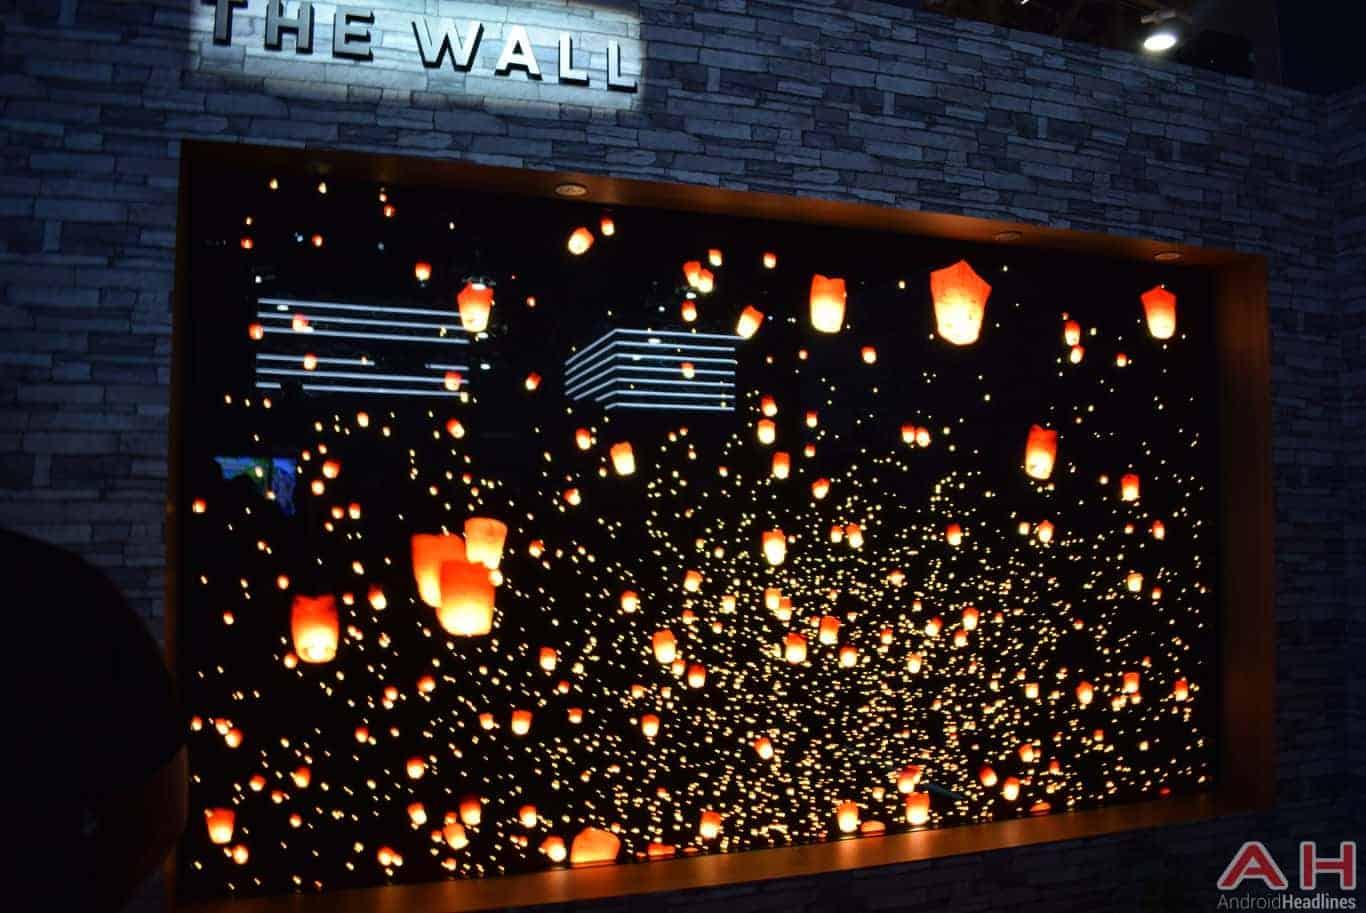 Samsung The Wall Modular MicroLED TV CES 2018 AH 10